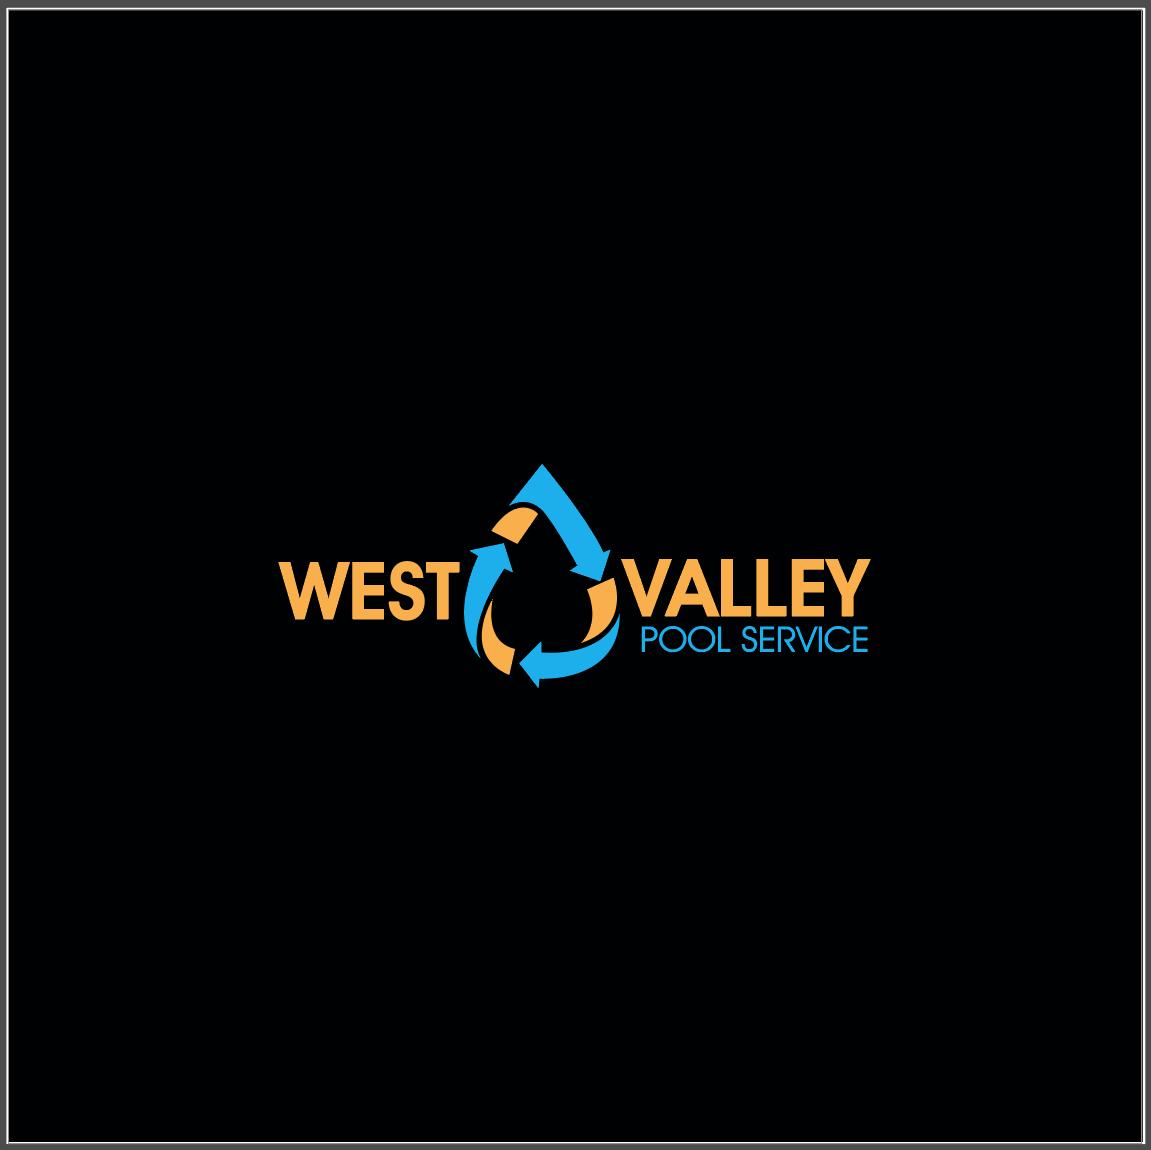 Logo Design by Sampath Gunathilaka - Entry No. 39 in the Logo Design Contest Clever Logo Design for West Valley Pool Service.